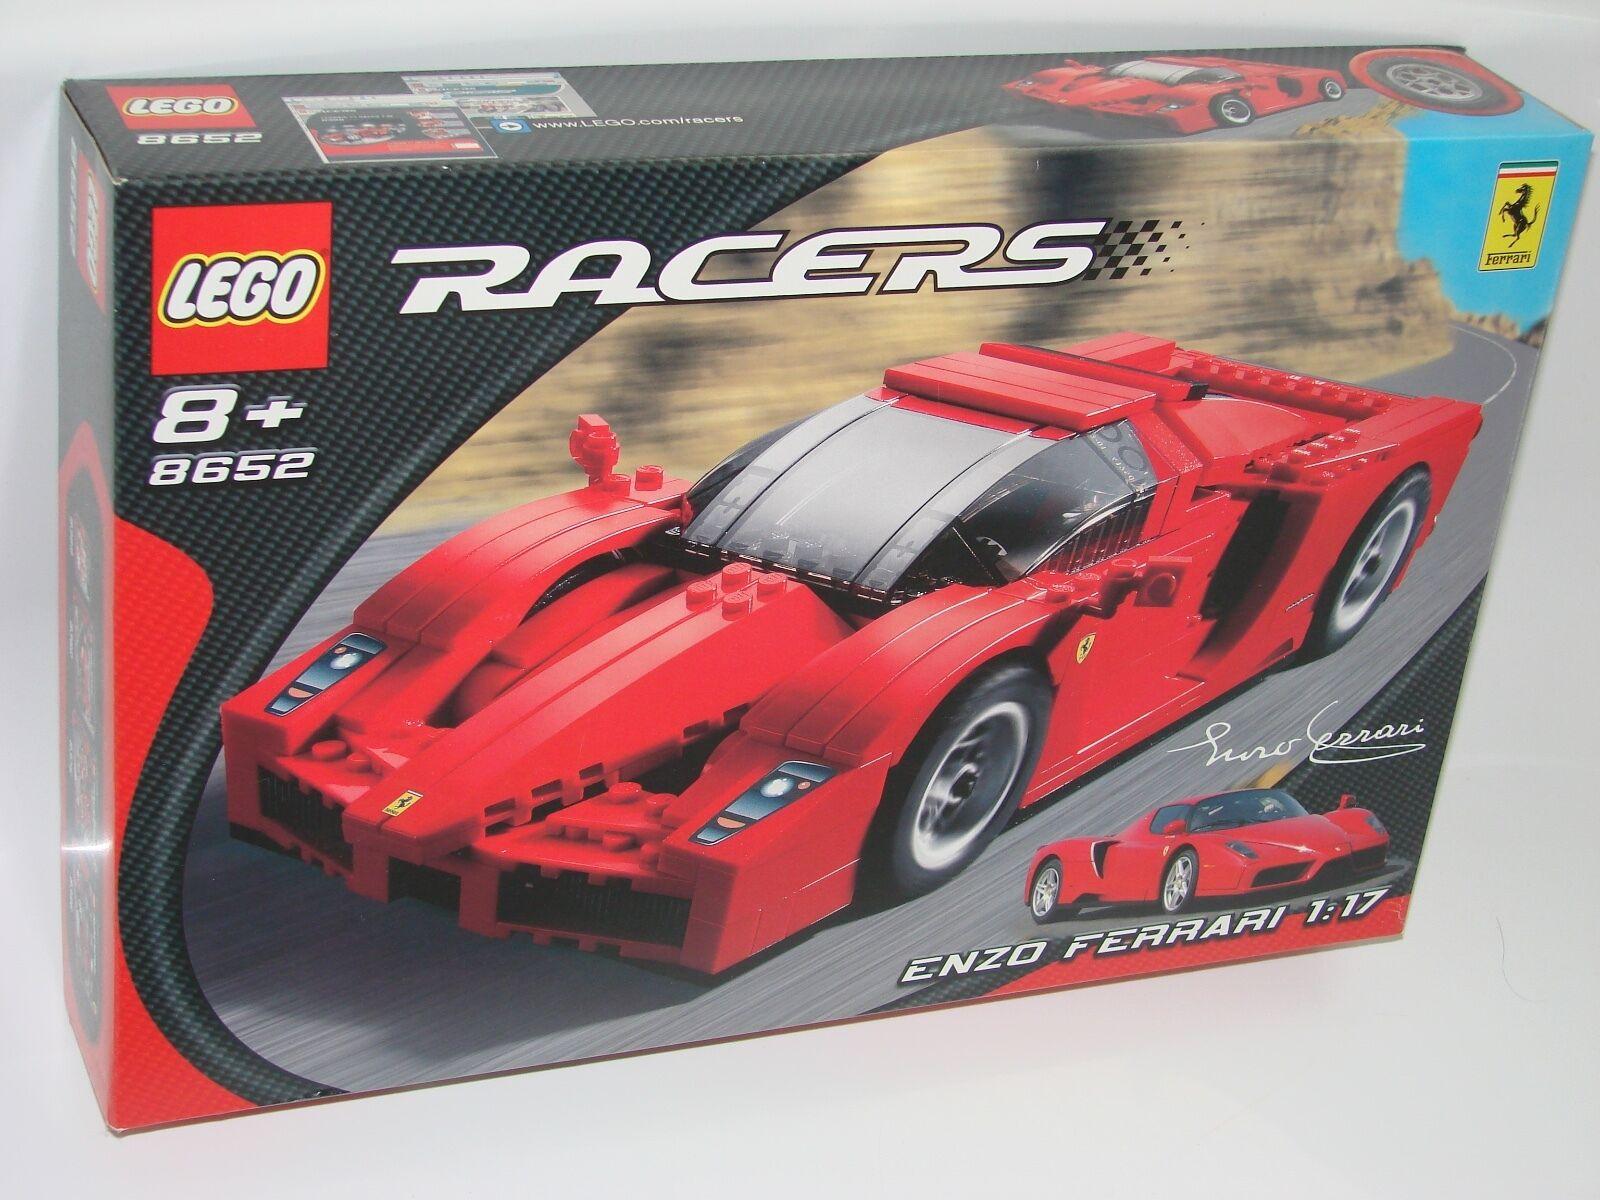 LEGO® Racers 8652 Enzo Ferrari 1 17 NEU OVP NEW NEW NEW MISB NRFB 5f6bbf